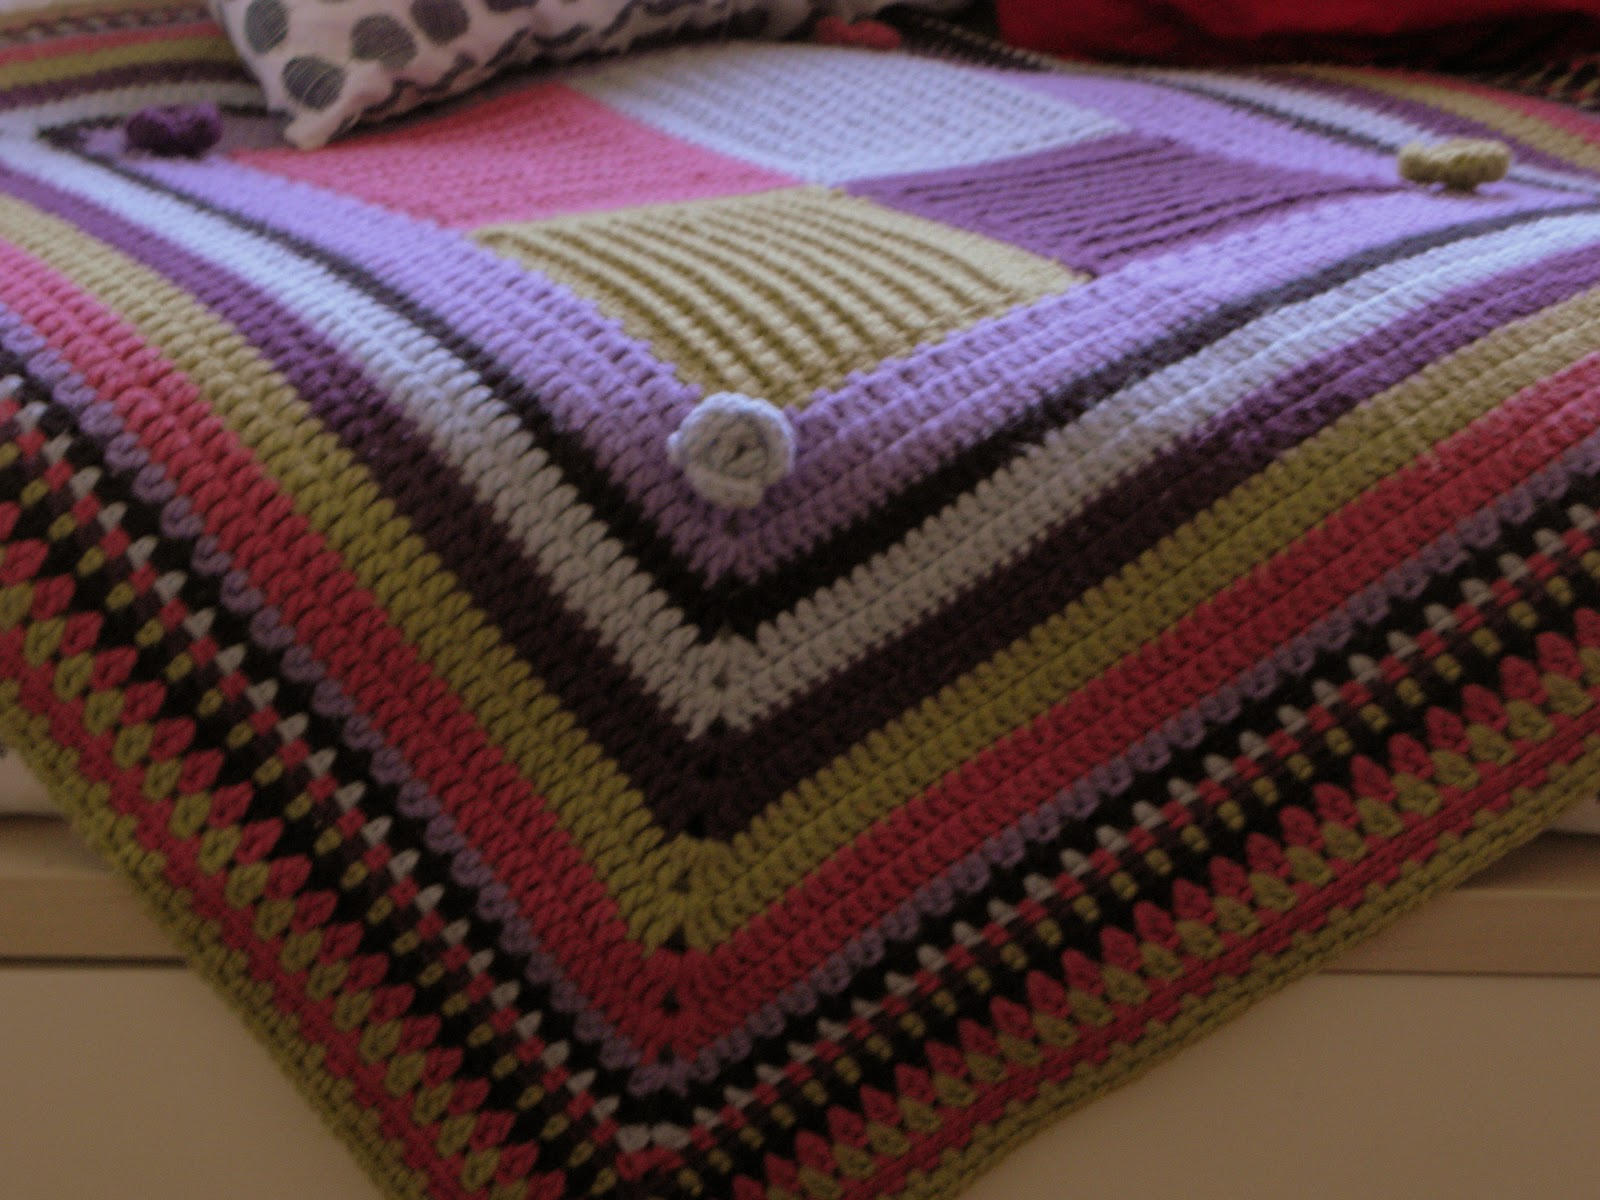 Ganchillos de izaskun manta june for Mantas de lana hechas a mano